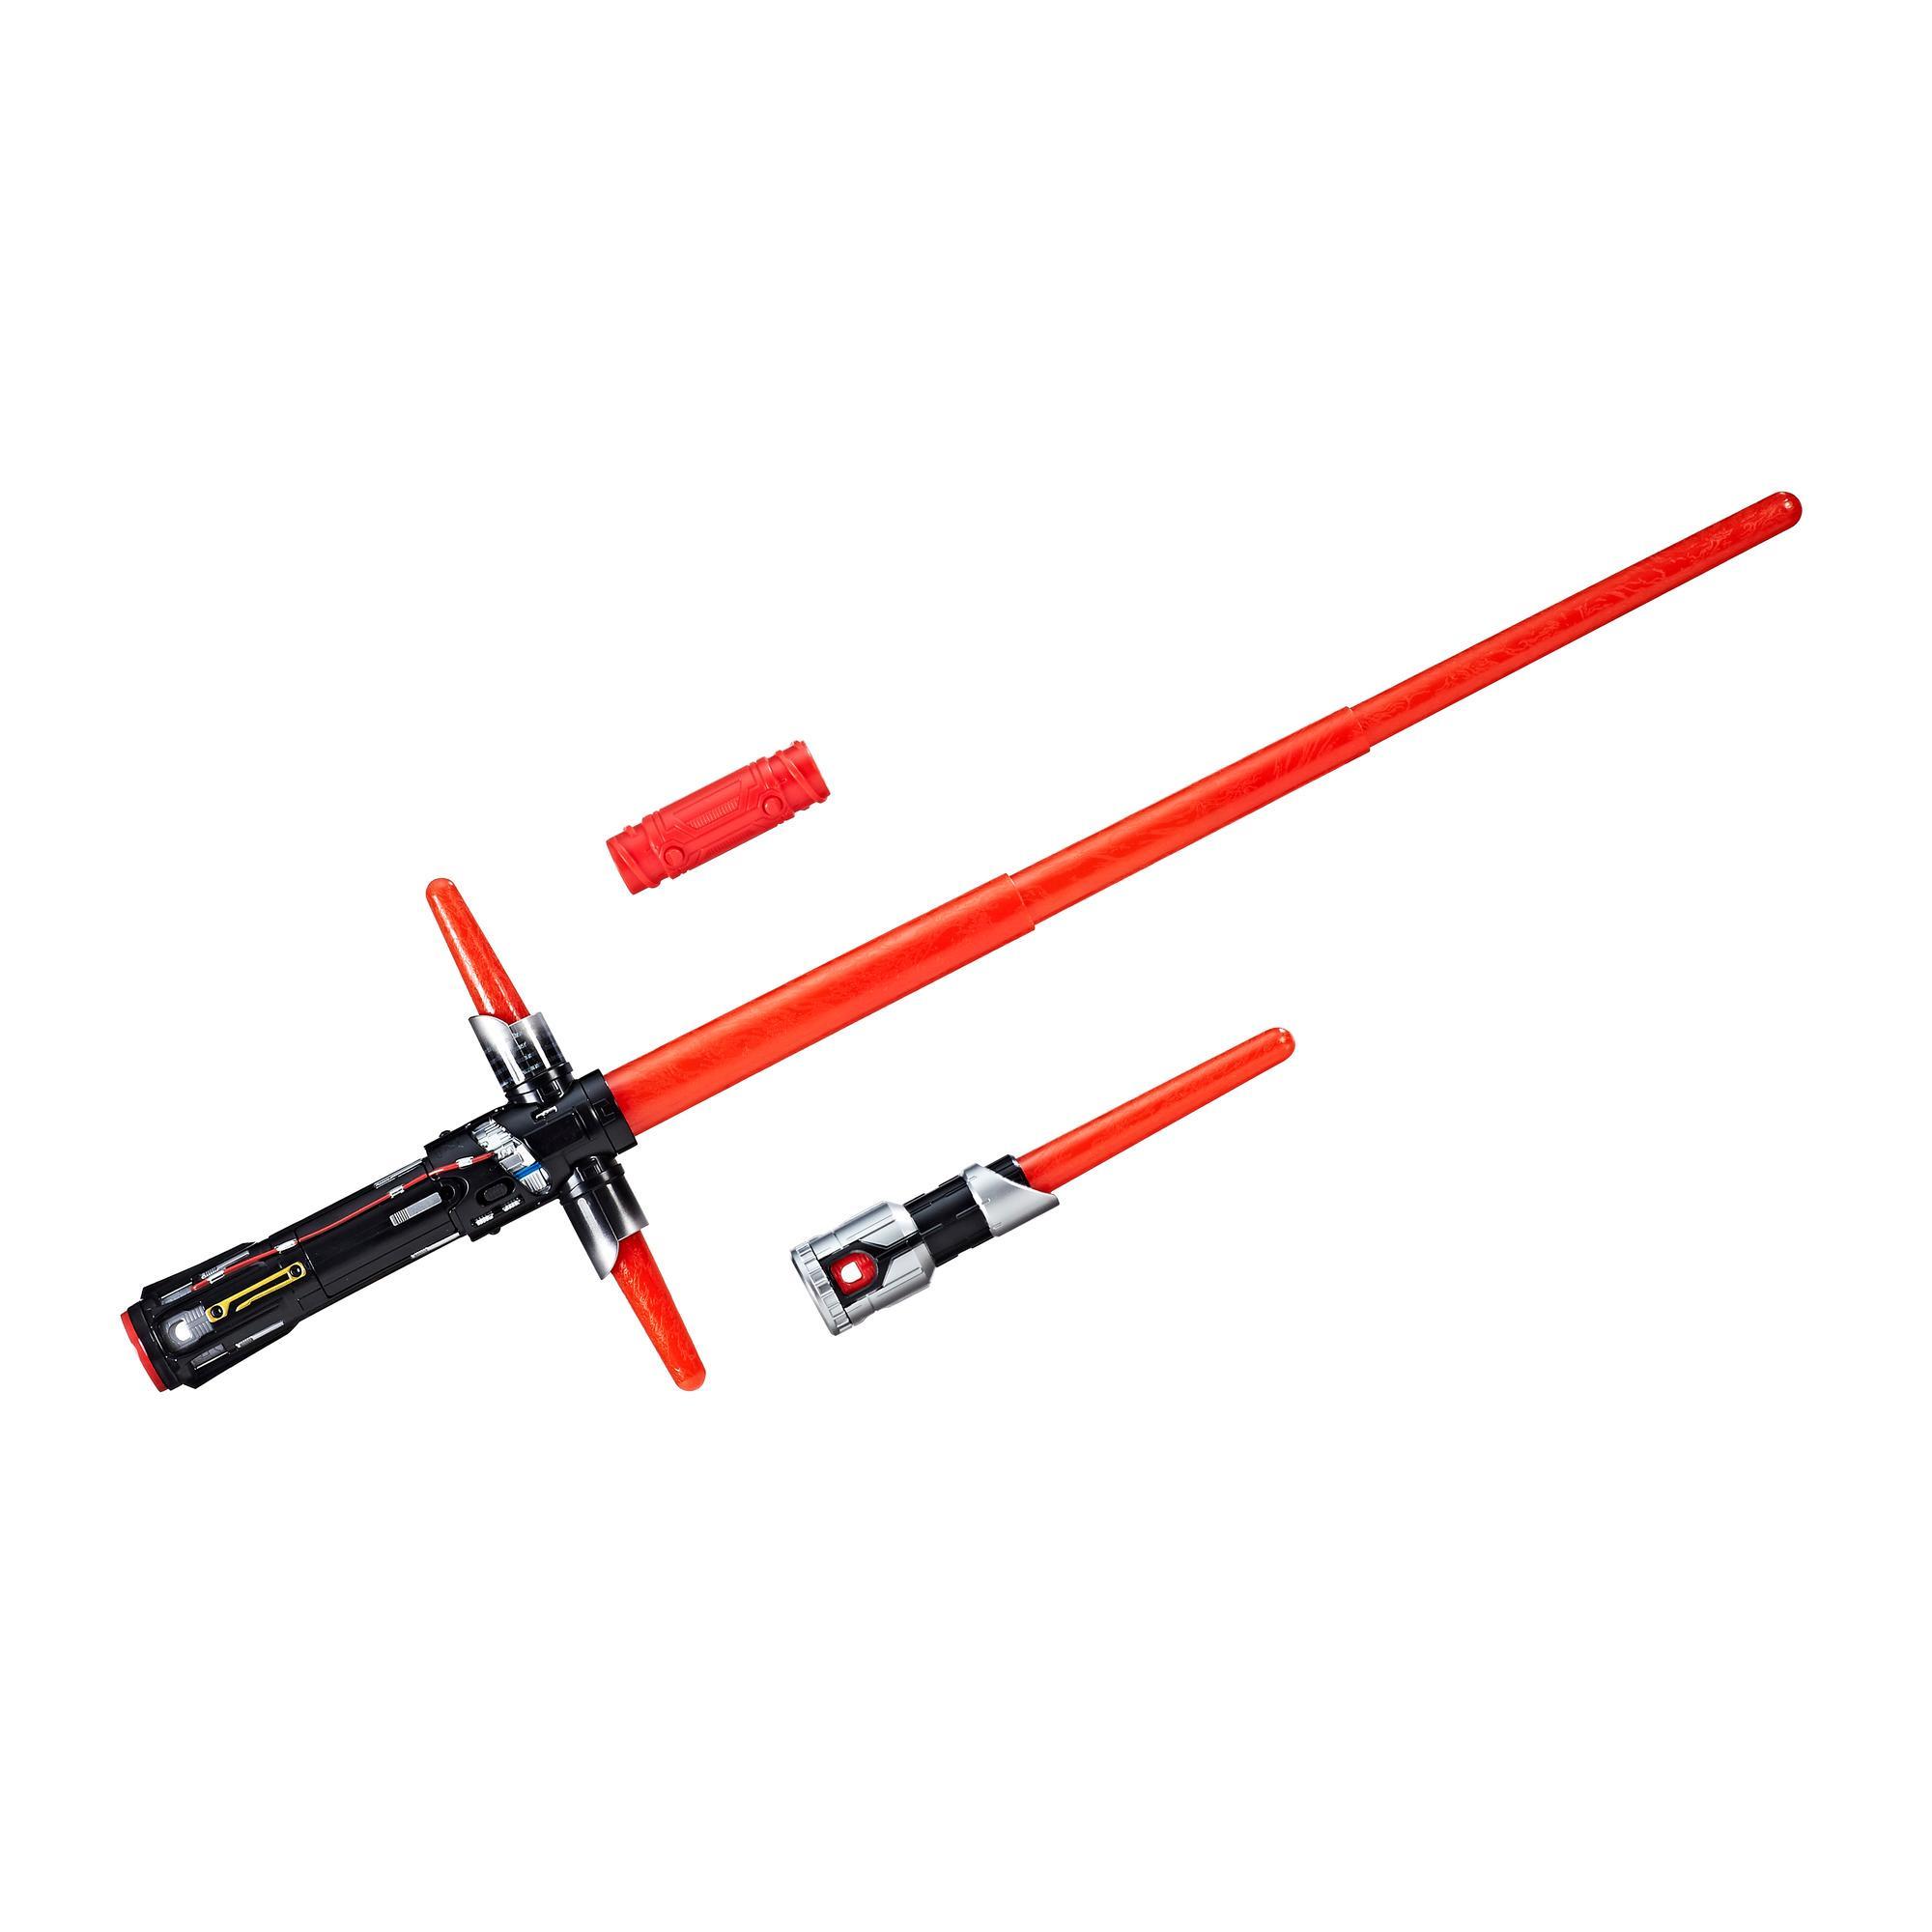 Star Wars: The Last Jedi Bladebuilders Kylo Ren Electronic Lightsaber